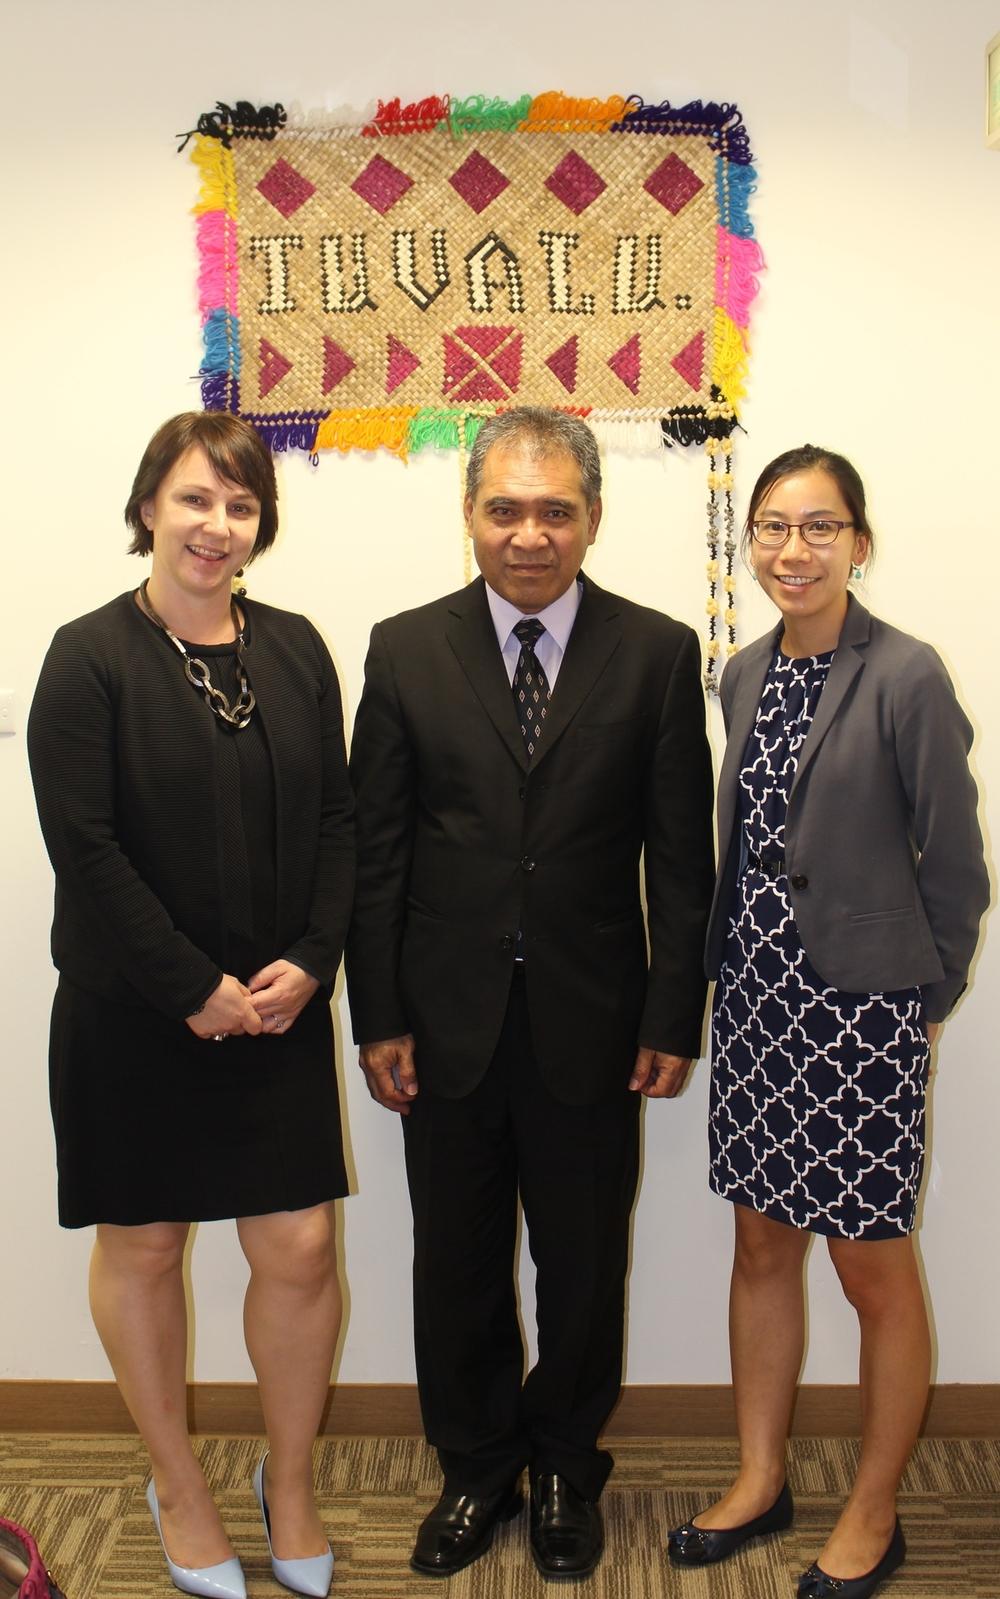 DirectorSi'alei Allegra Van Toor, Ambassador Minute Alapati Taupo, and Deputy Director Serena Chui/范希雷代表、陶敏德大使與徐嘉明 副代表